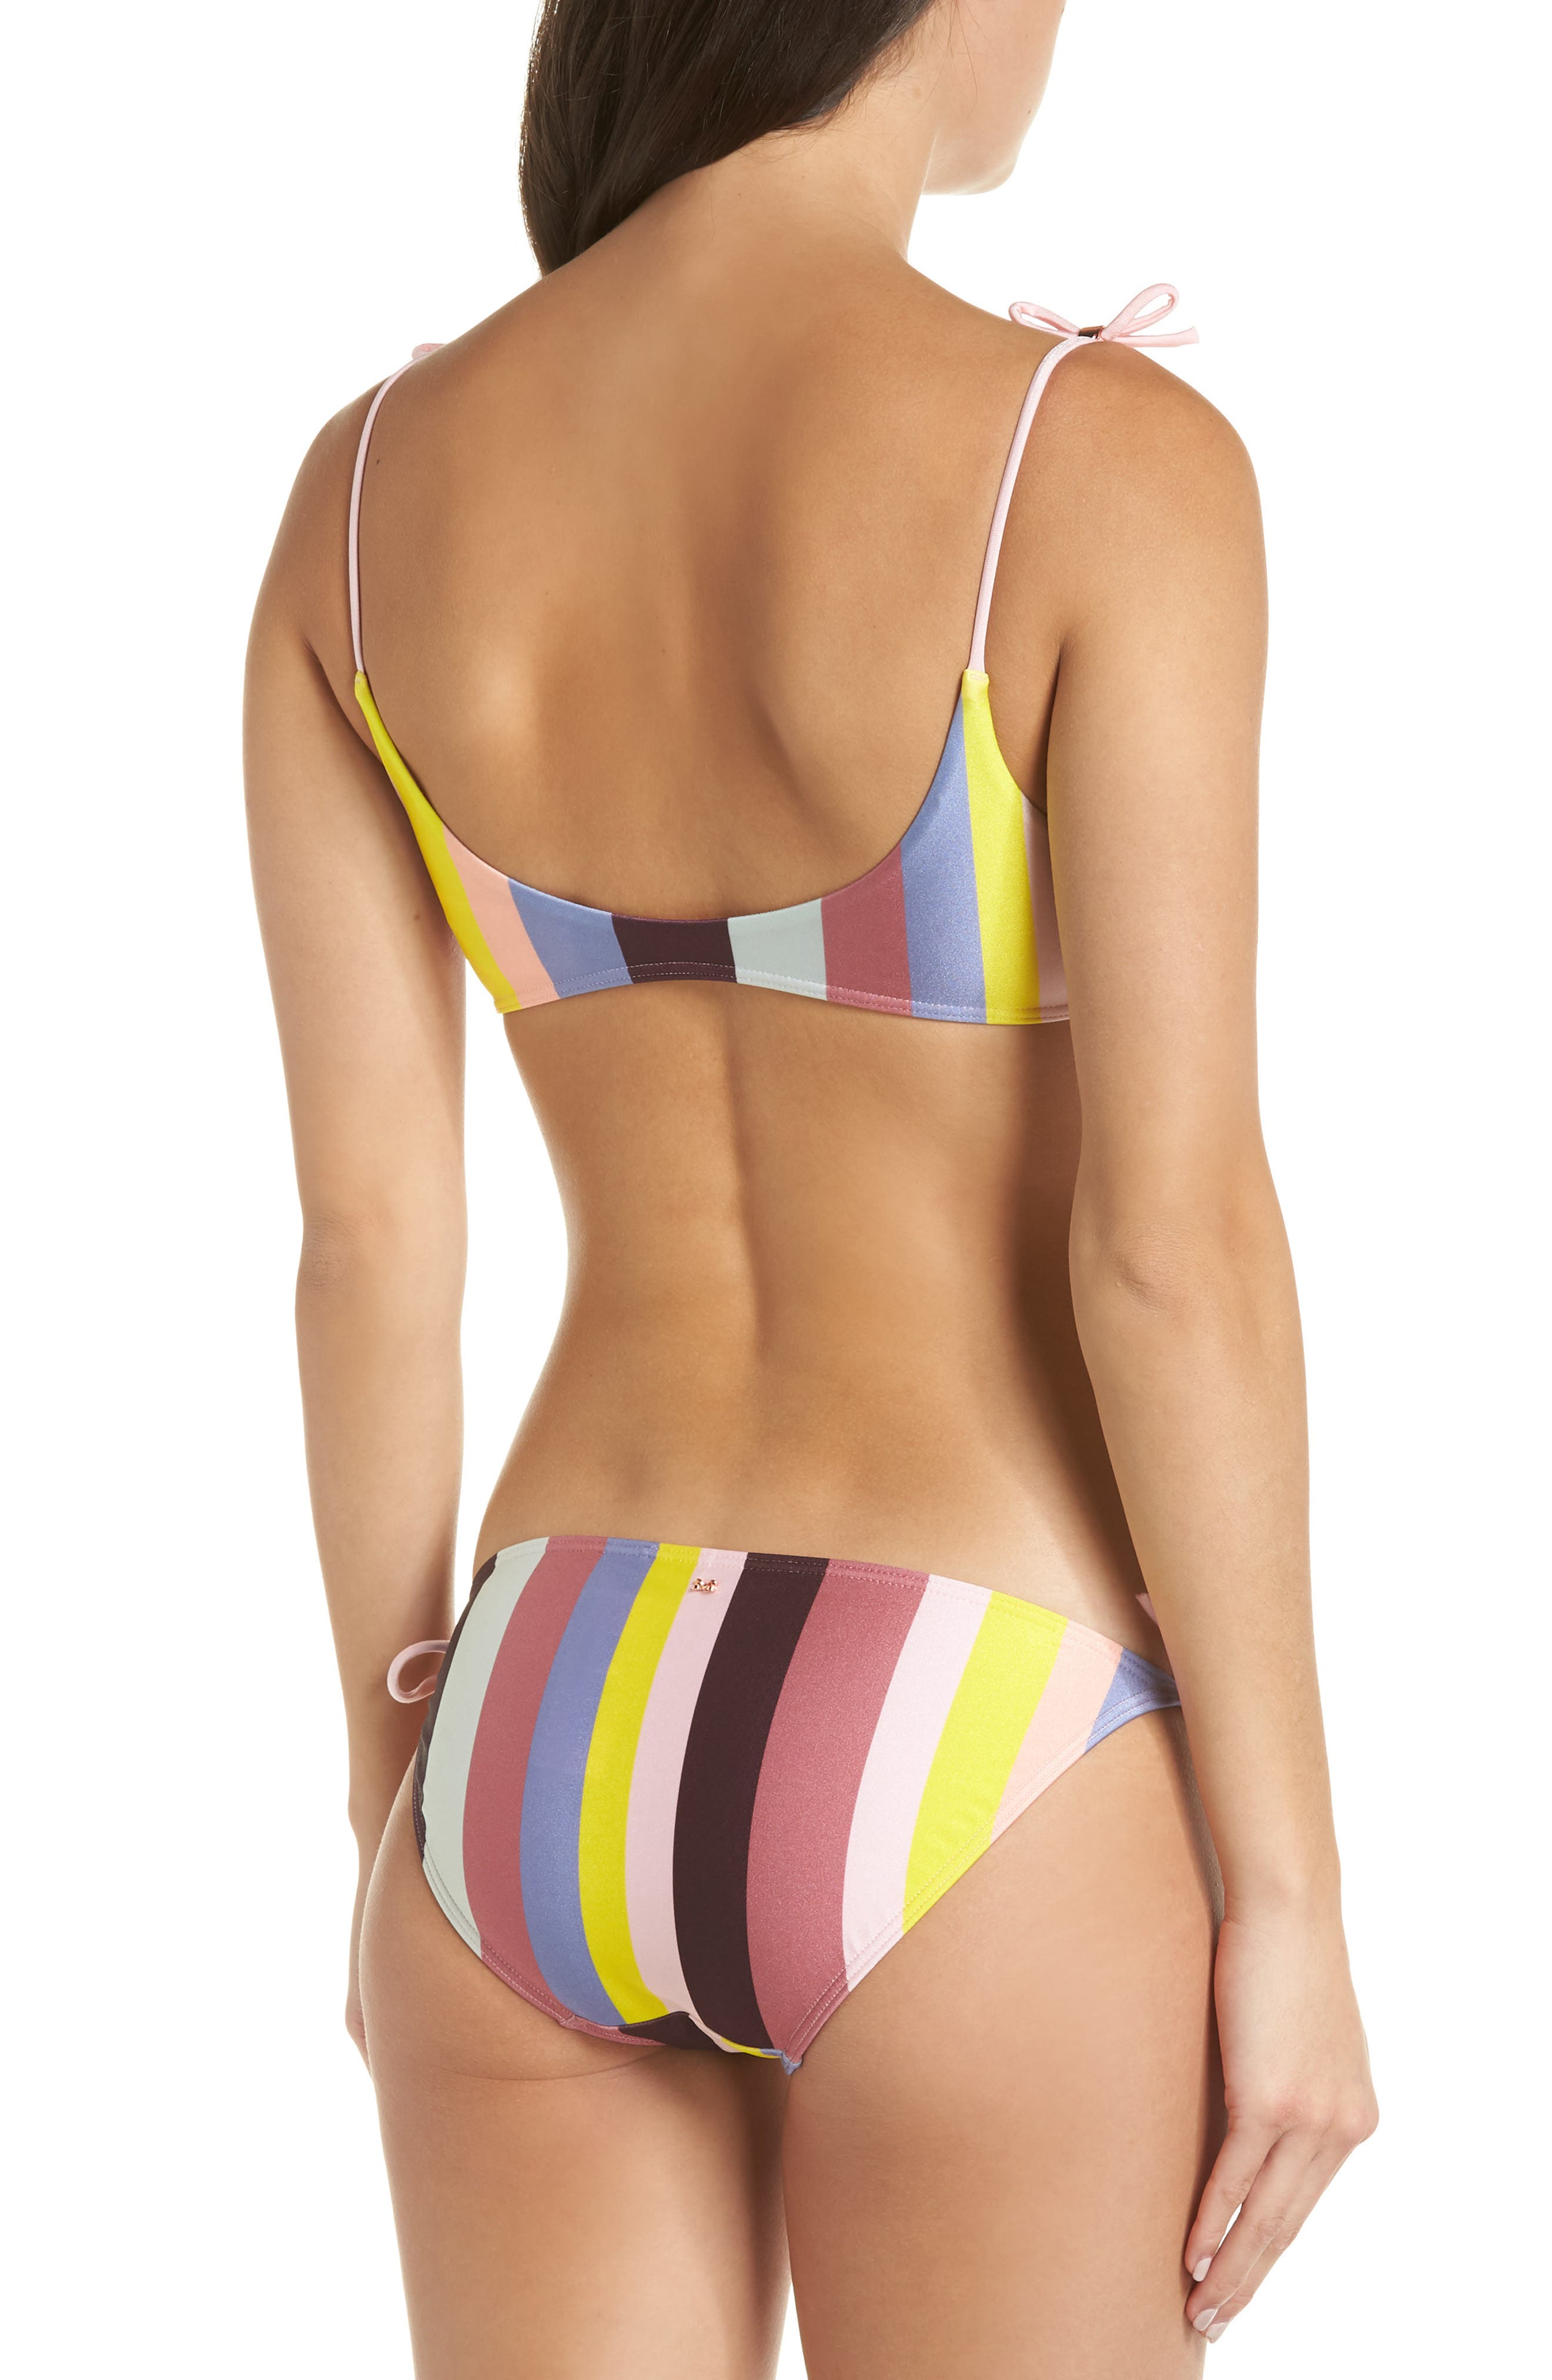 Penora Rio Stripe Bikini Top,                             Alternate thumbnail 8, color,                             LIGHT PINK